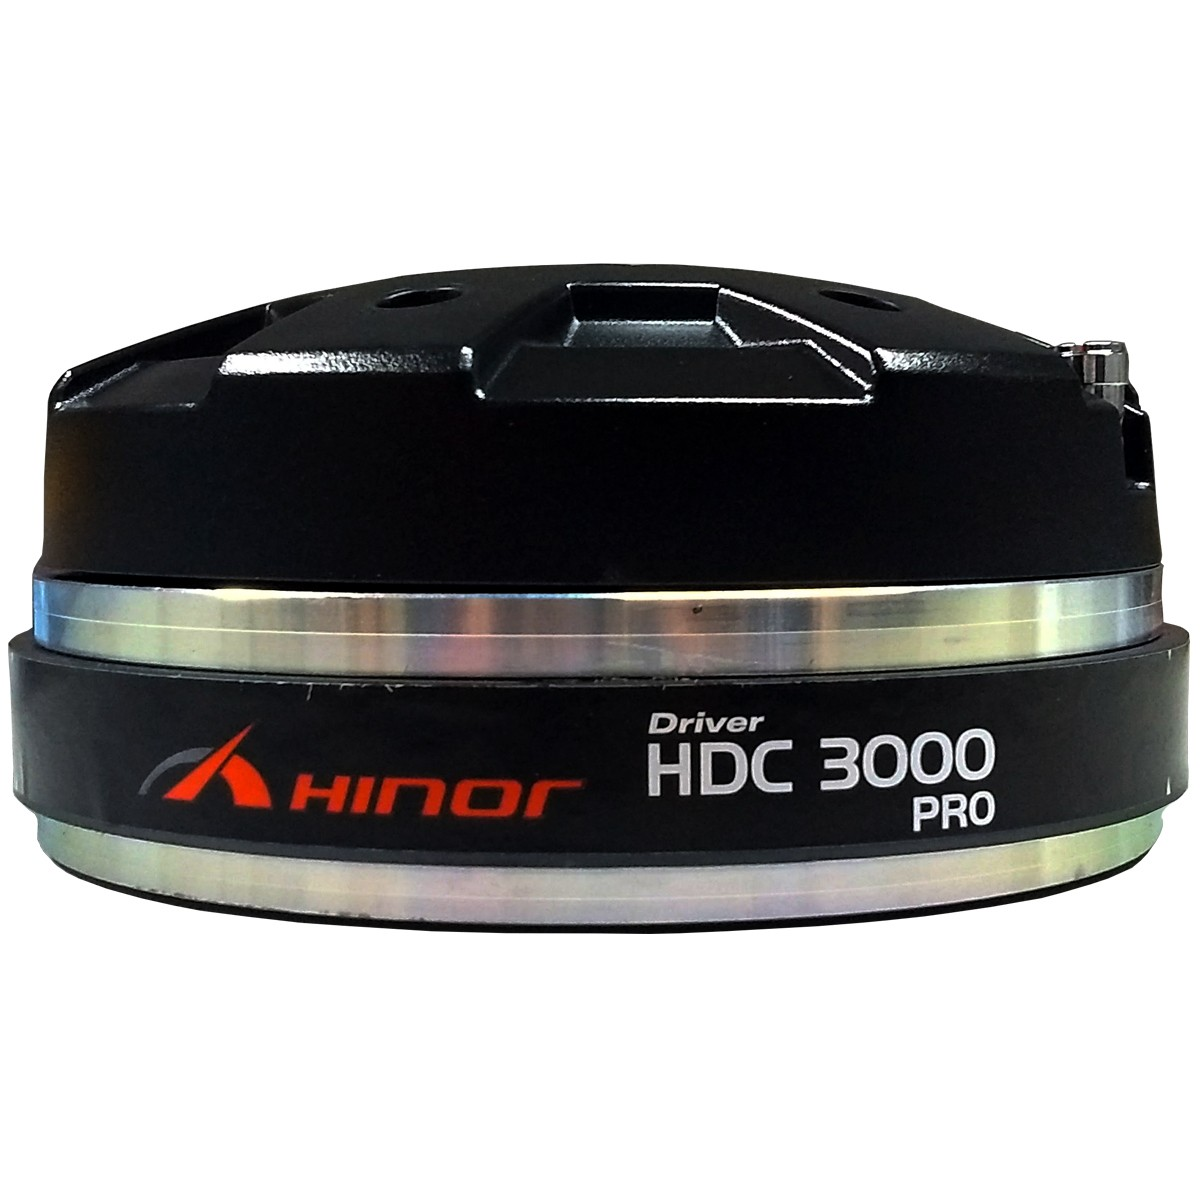 Driver Para Som Automotivo 300W Rms 8 Ohms Hdc 3000 Pro - Hinor